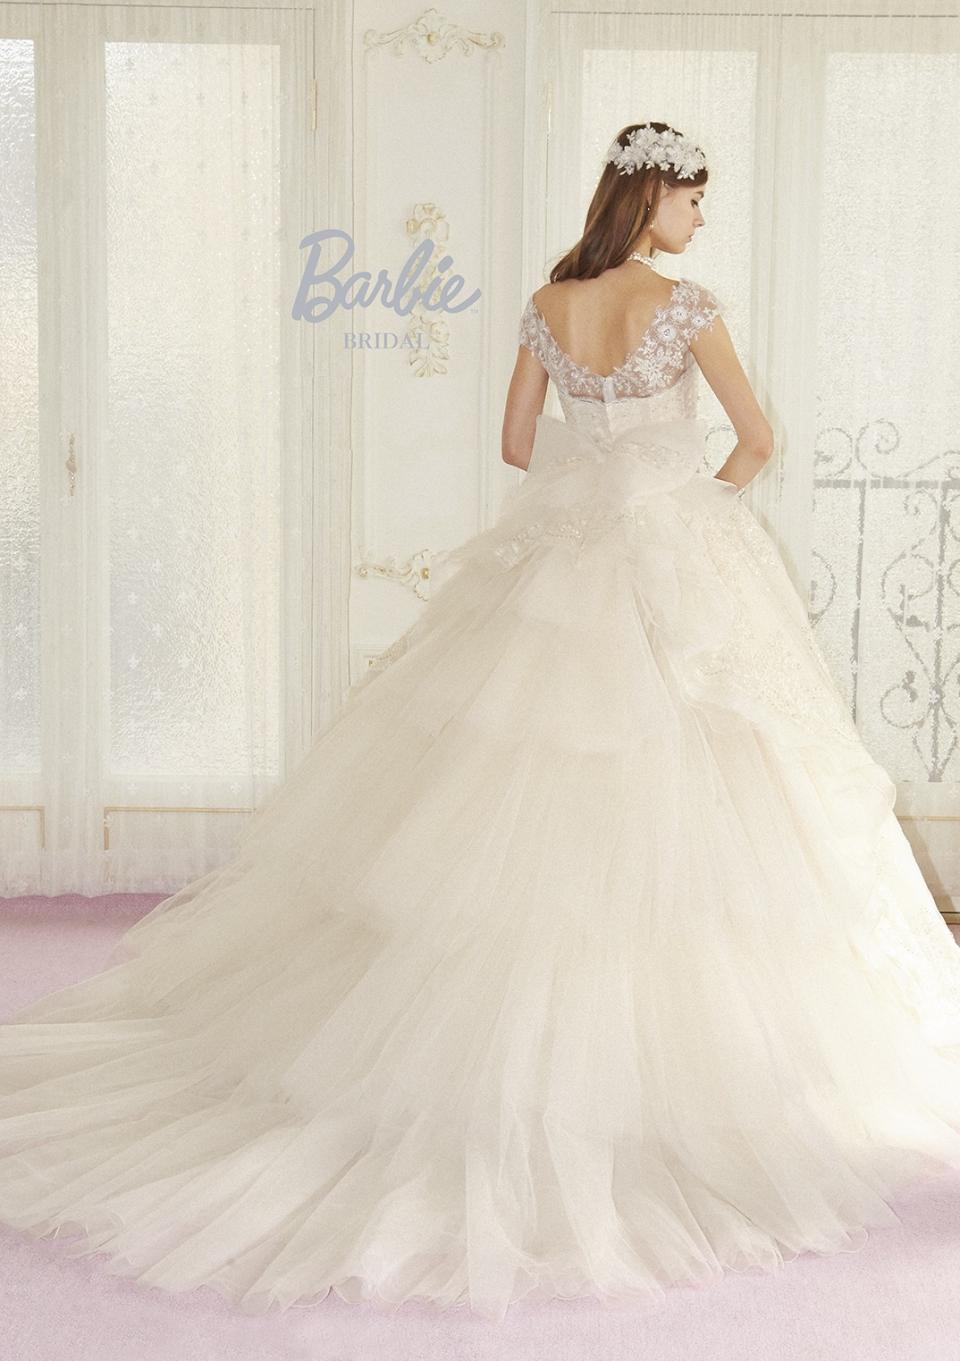 Barbie BRIDALウェディングドレス